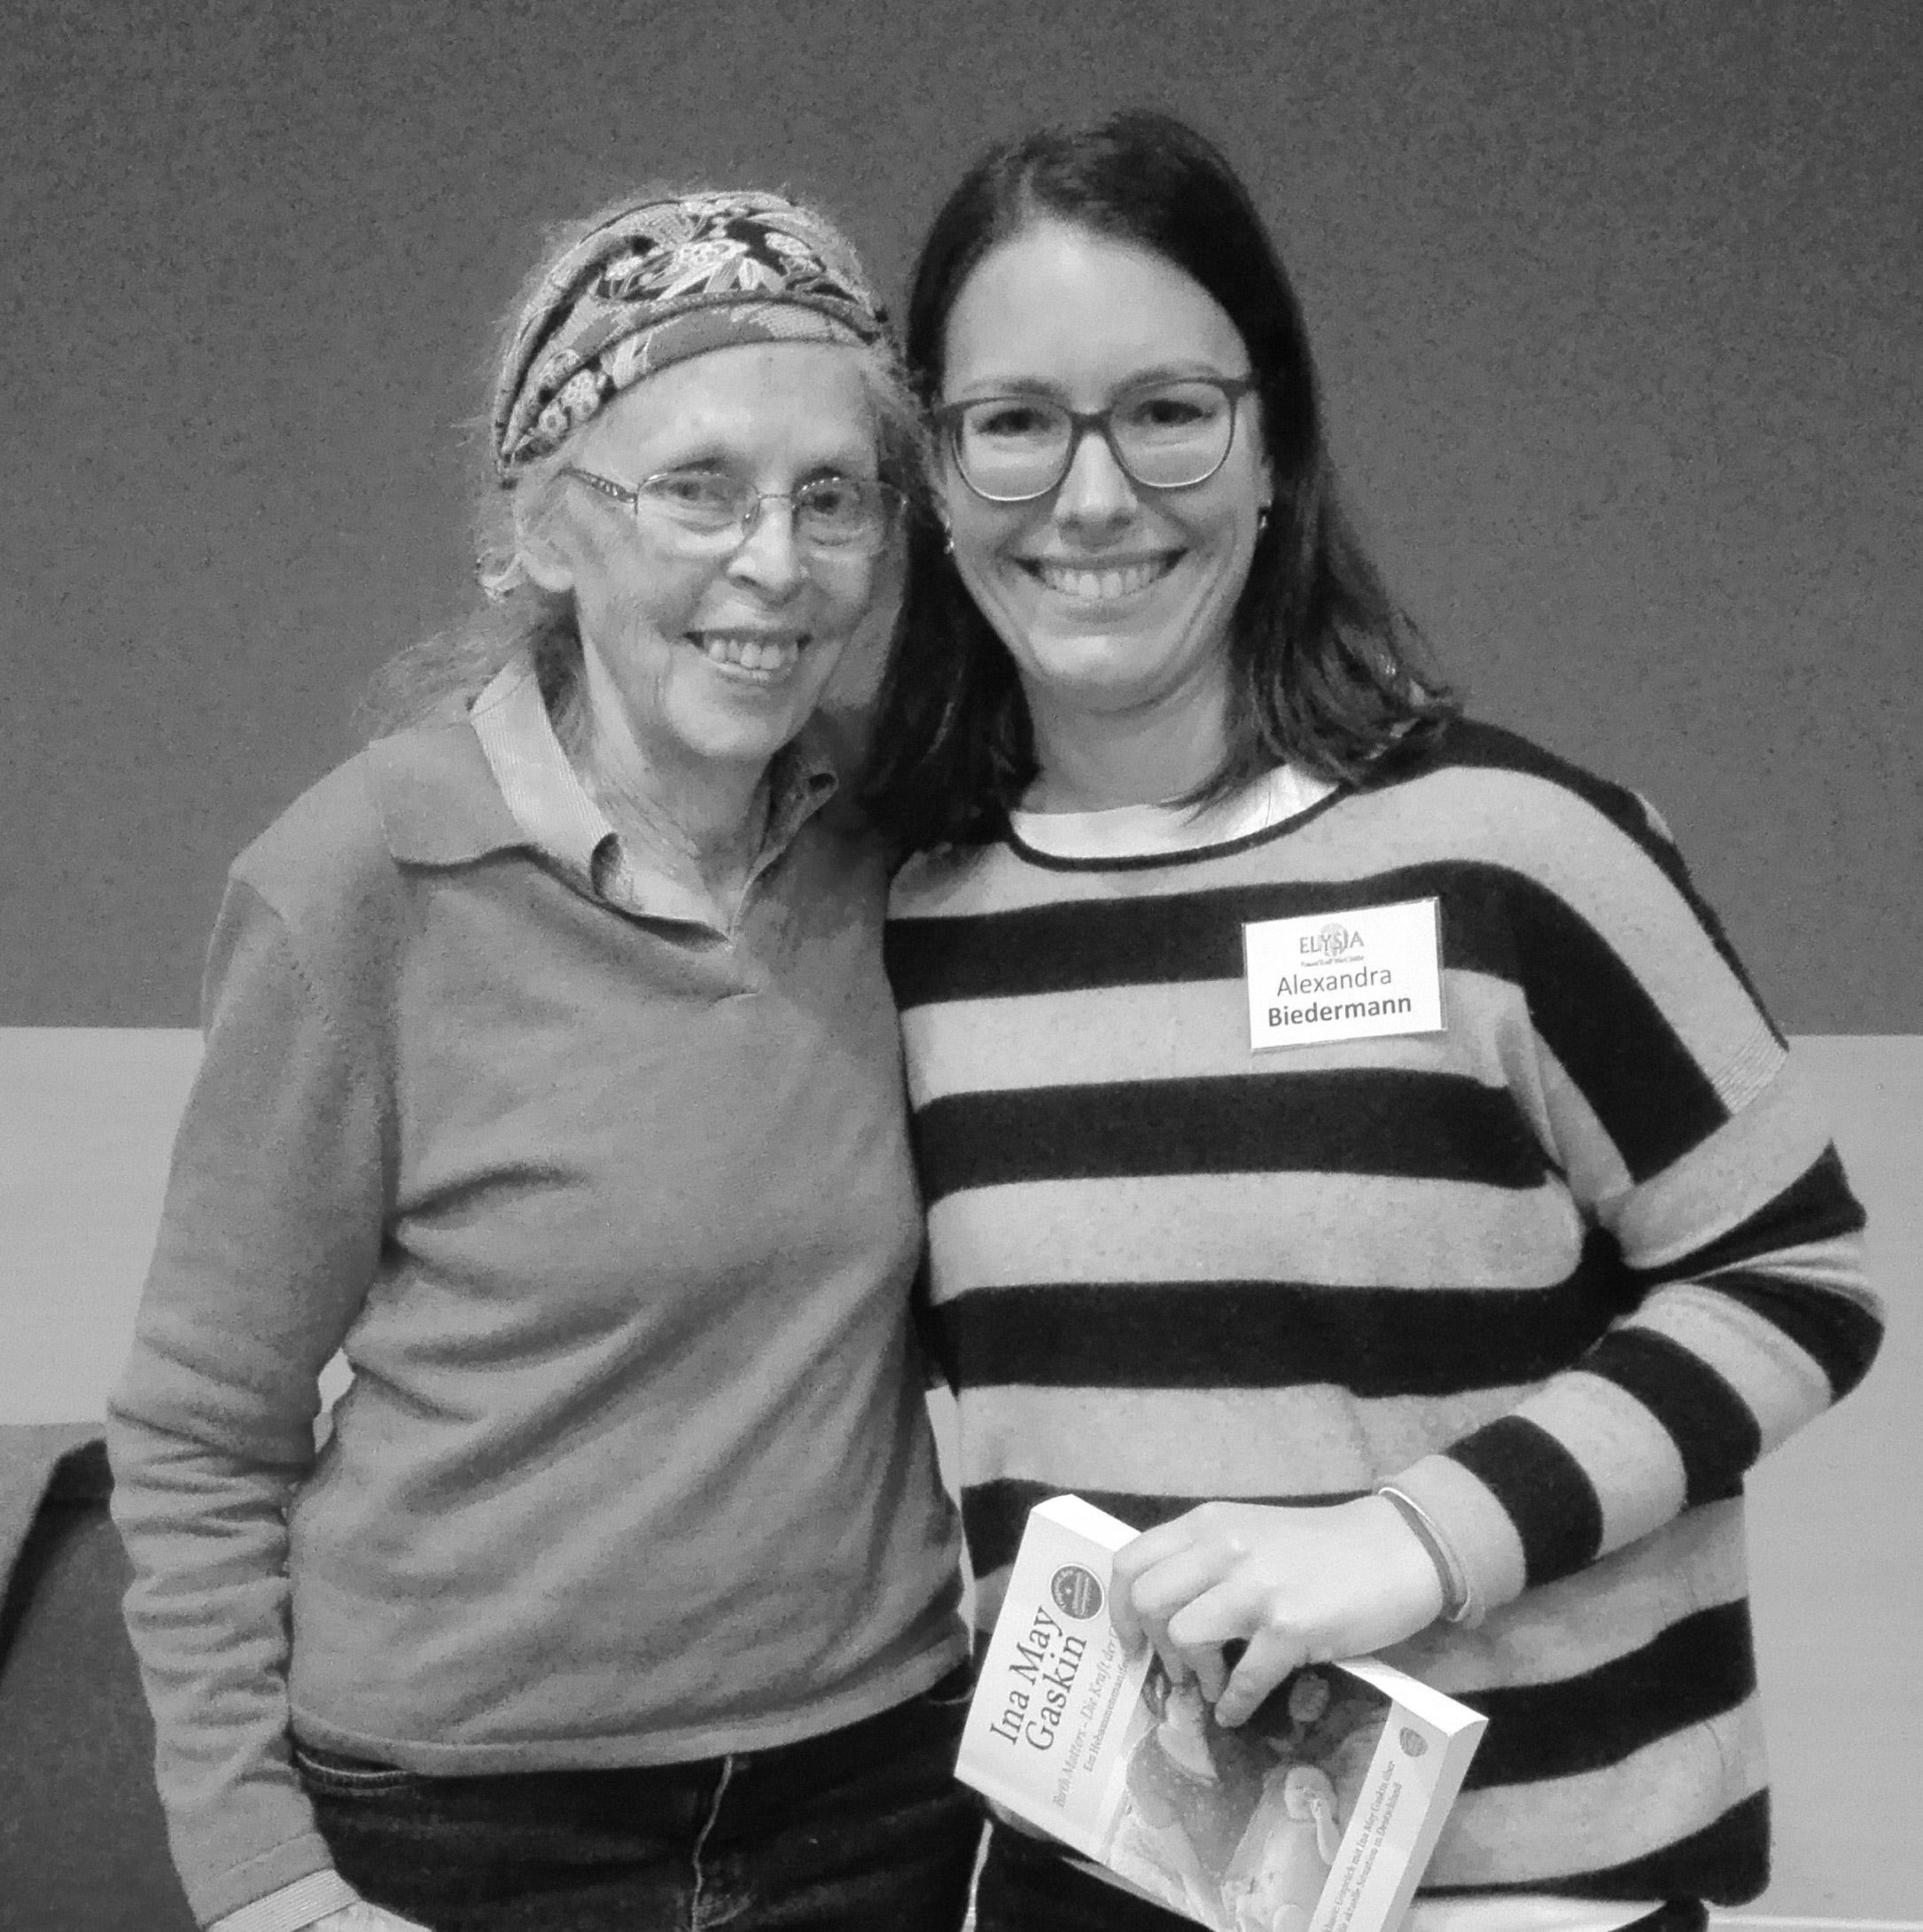 2-tägiger Workshop mit Ina May Gaski